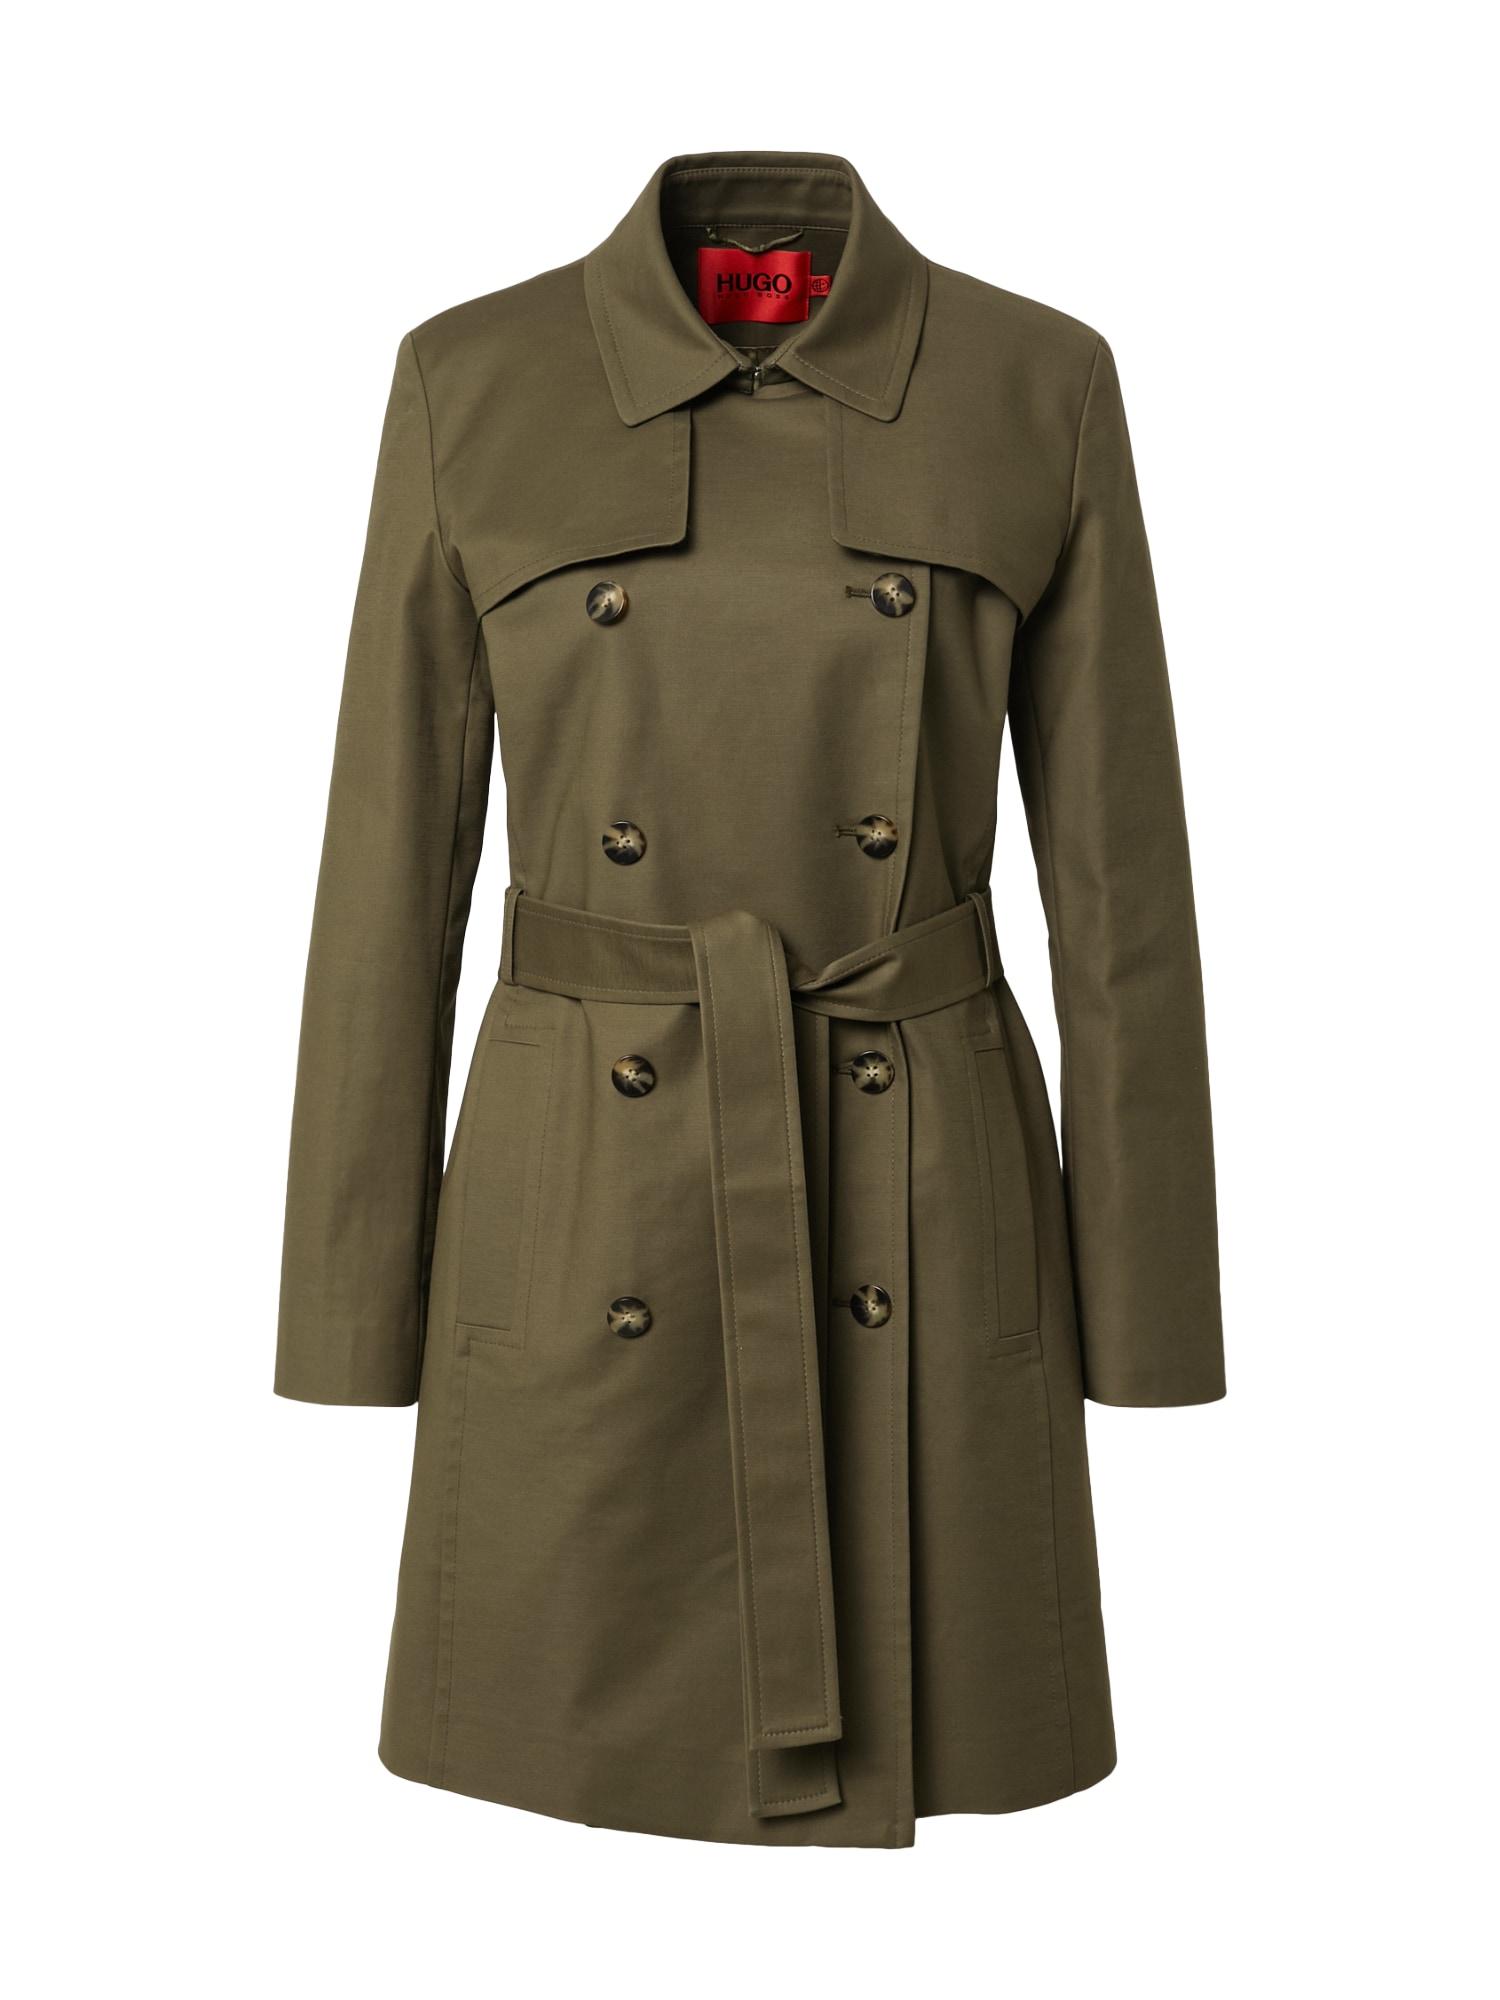 HUGO Demisezoninis paltas 'Makaras' rusvai žalia